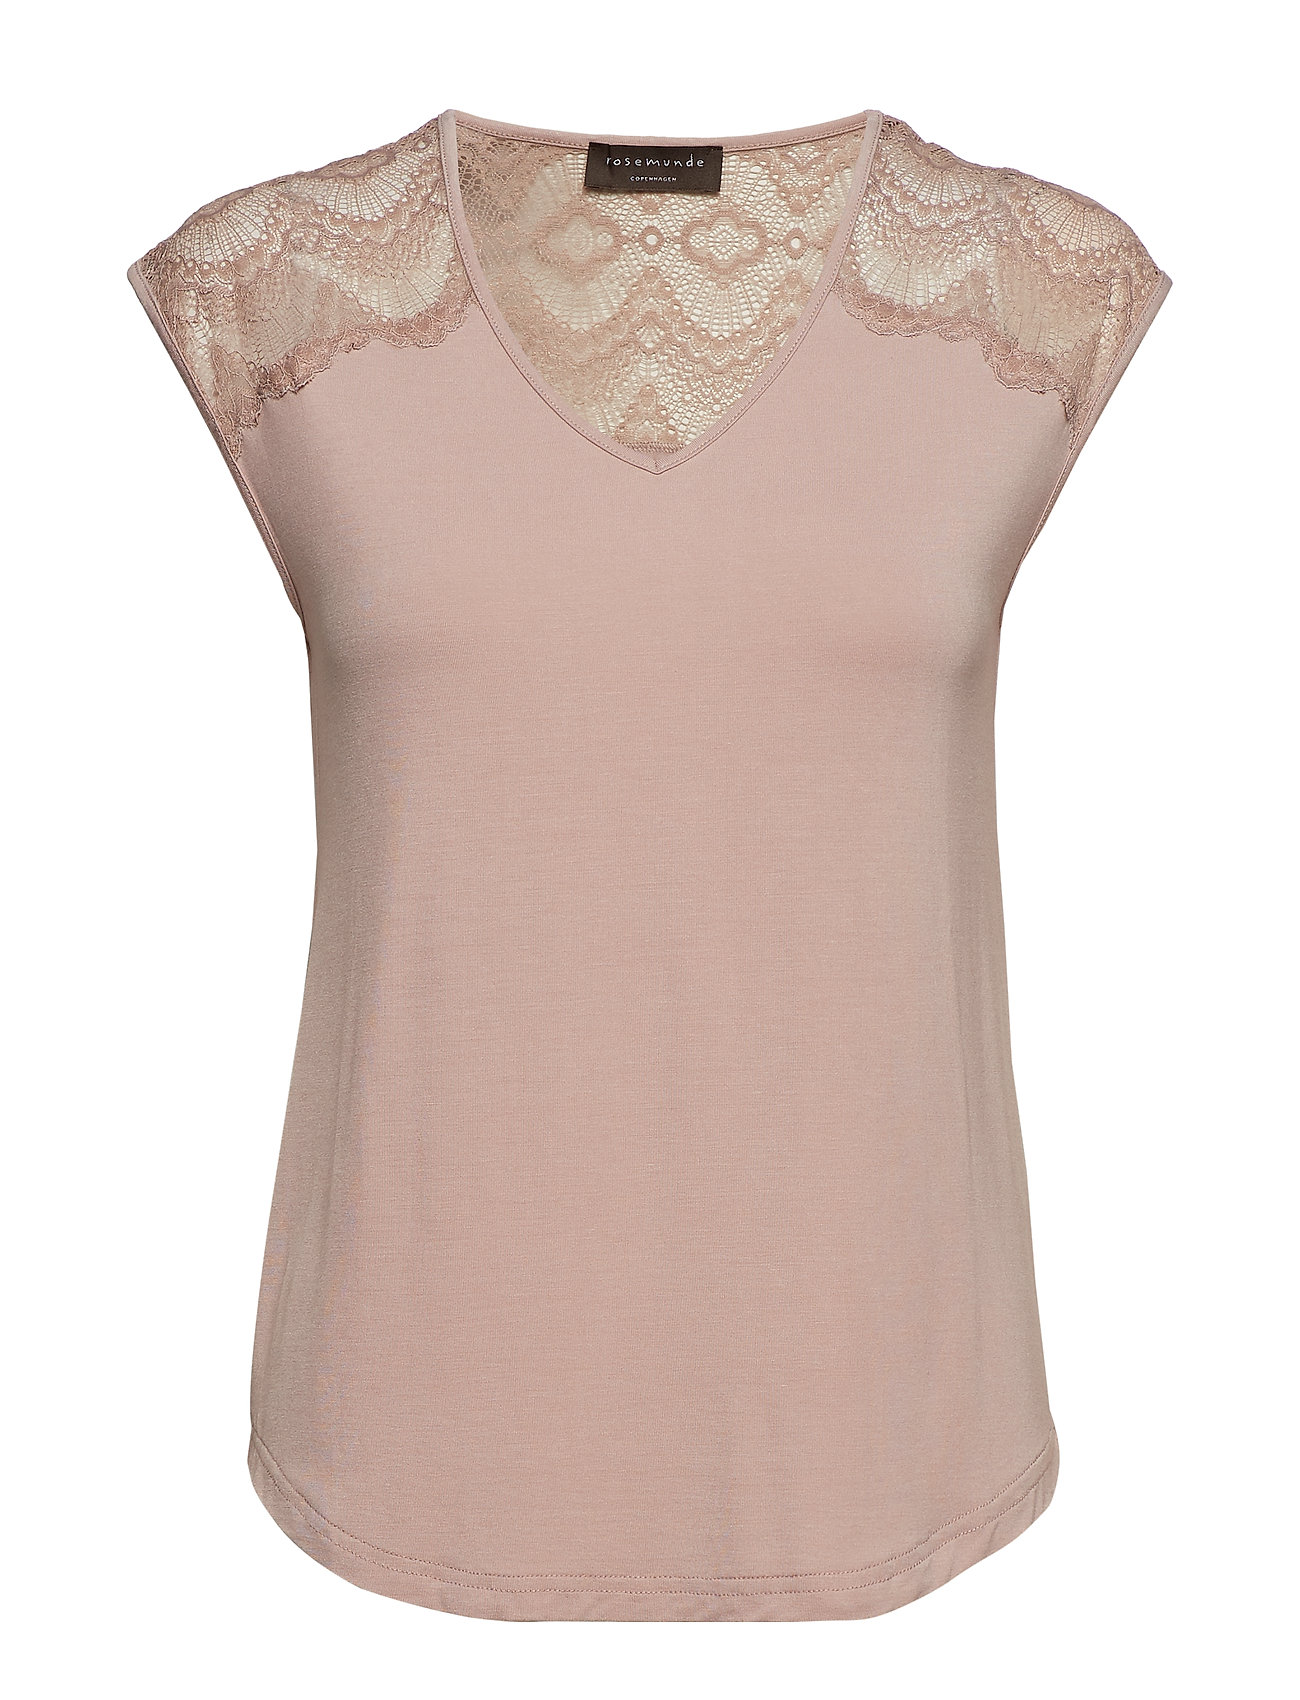 Rosemunde T-shirt ss - VINTAGE POWDER